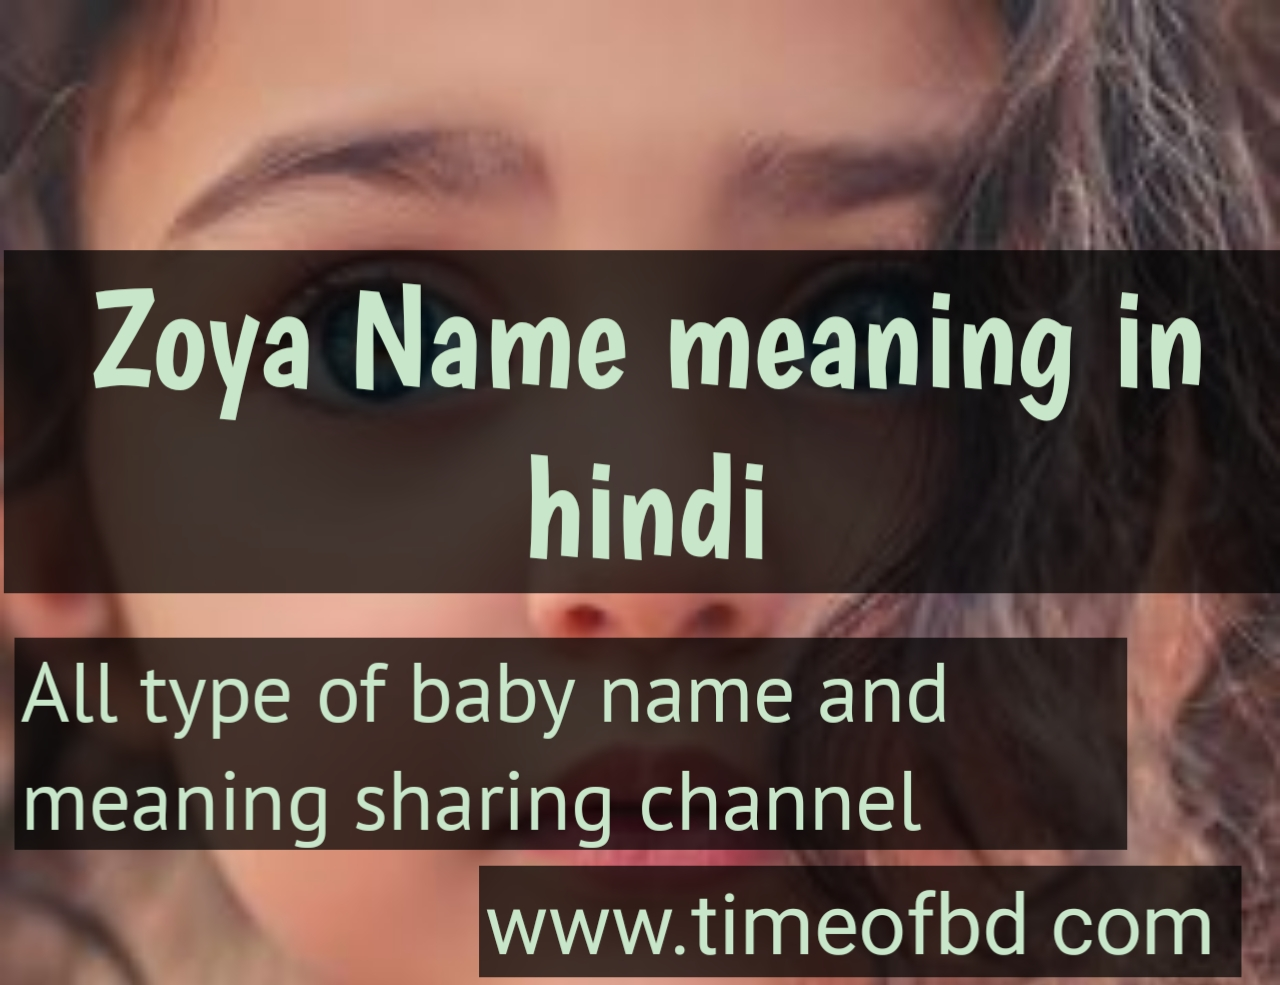 zoya  name meaning in hindi, zoya ka meaning ,zoya meaning in hindi dictioanry,meaning of zoya  in hindi